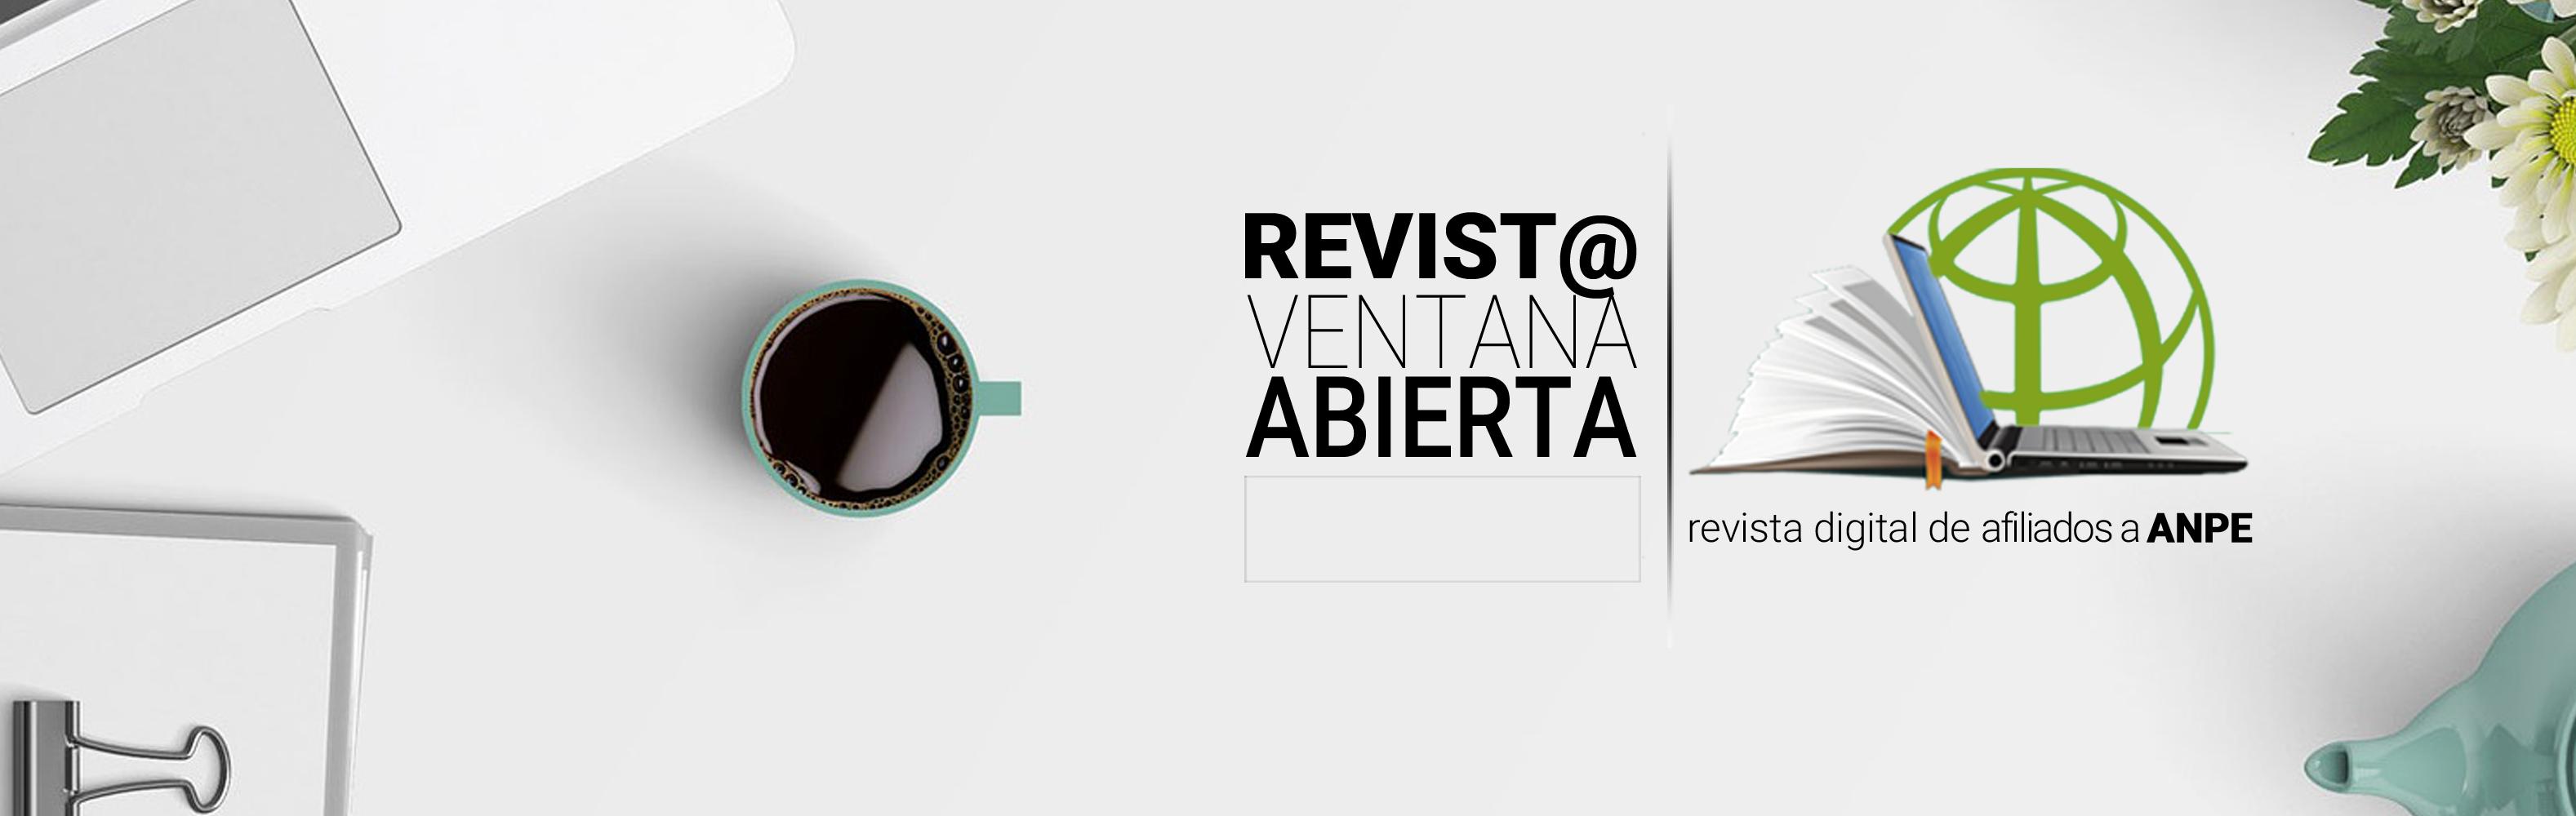 Revista digital Ventana Abierta